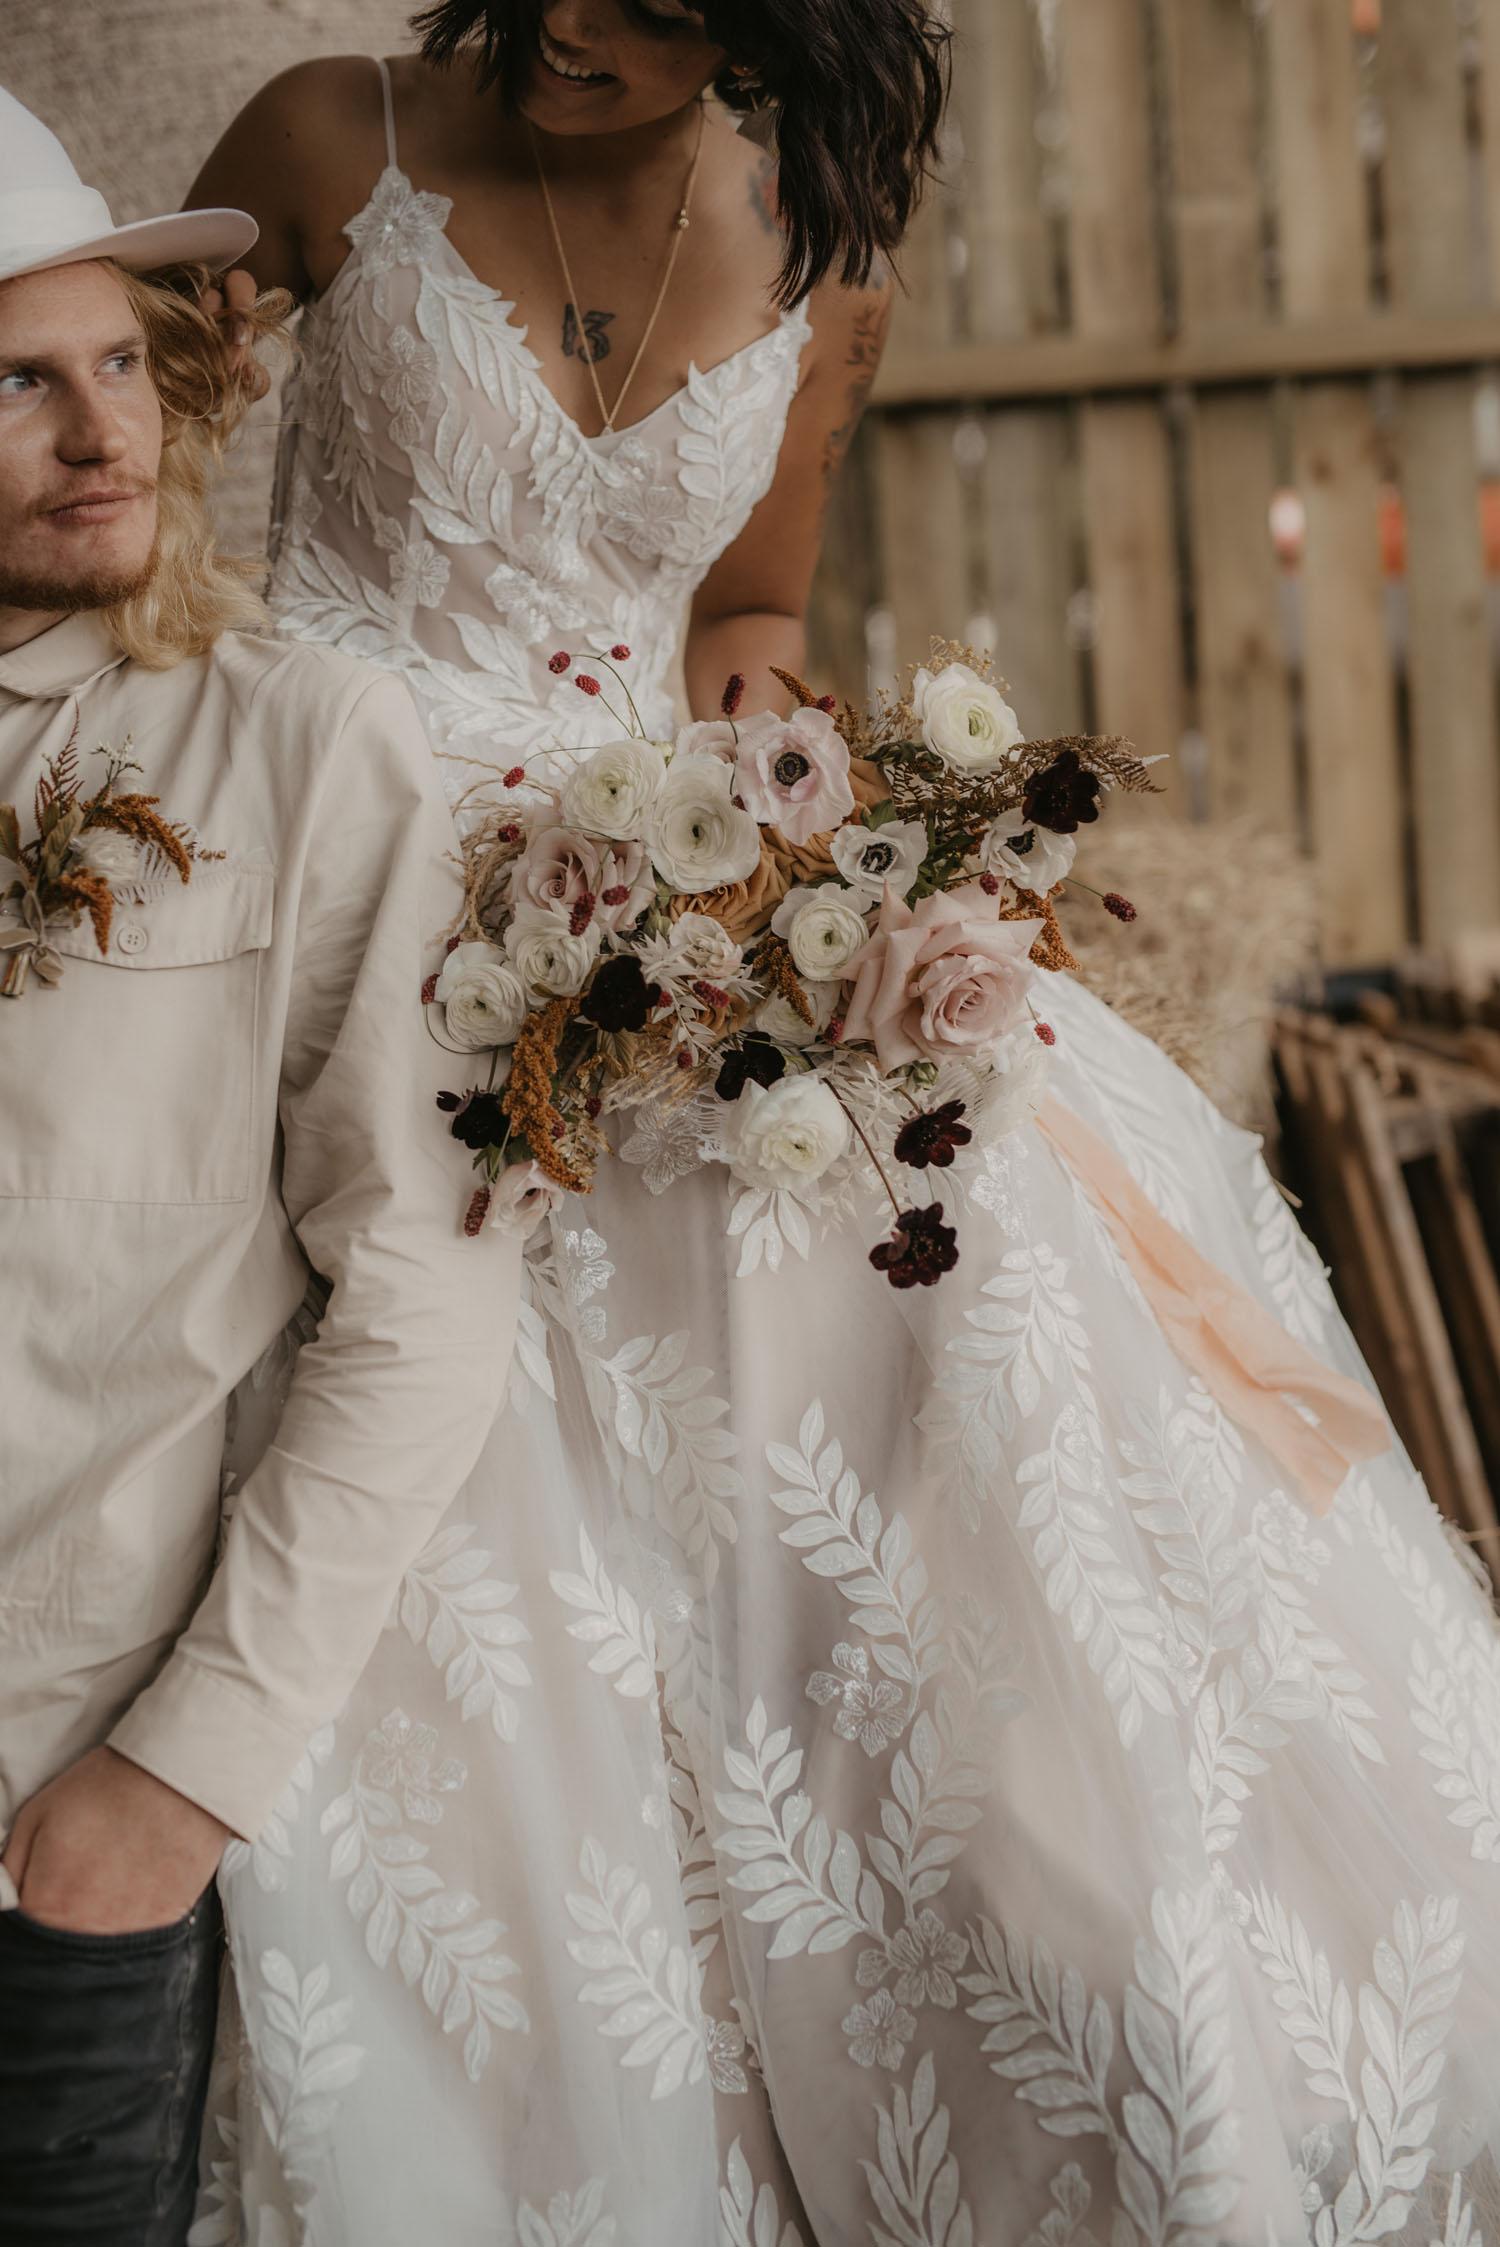 Rustic barn wedding inspiration